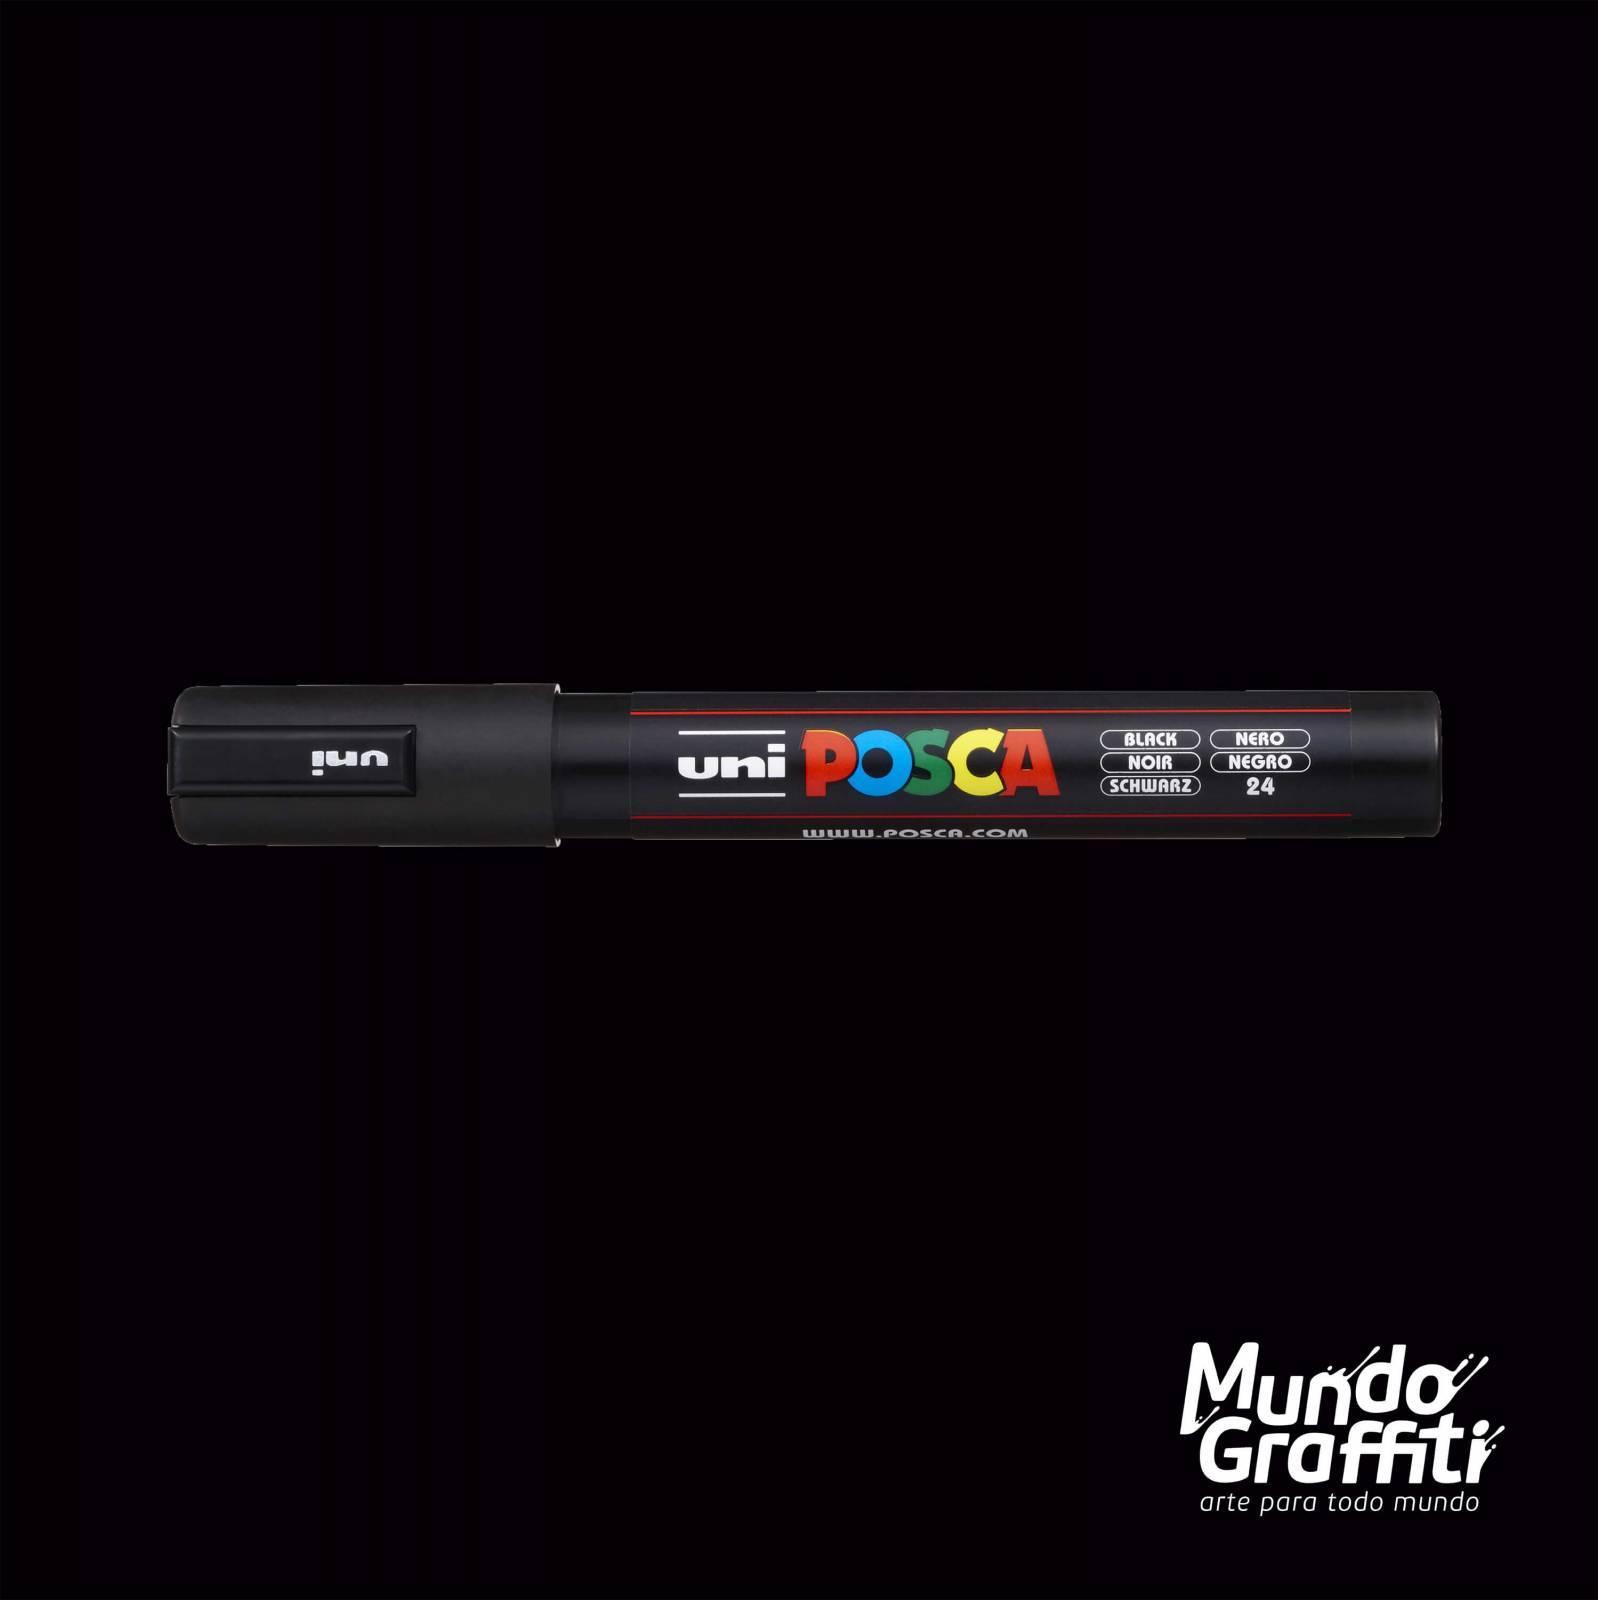 Caneta Posca 5M Preto - Mundo Graffiti